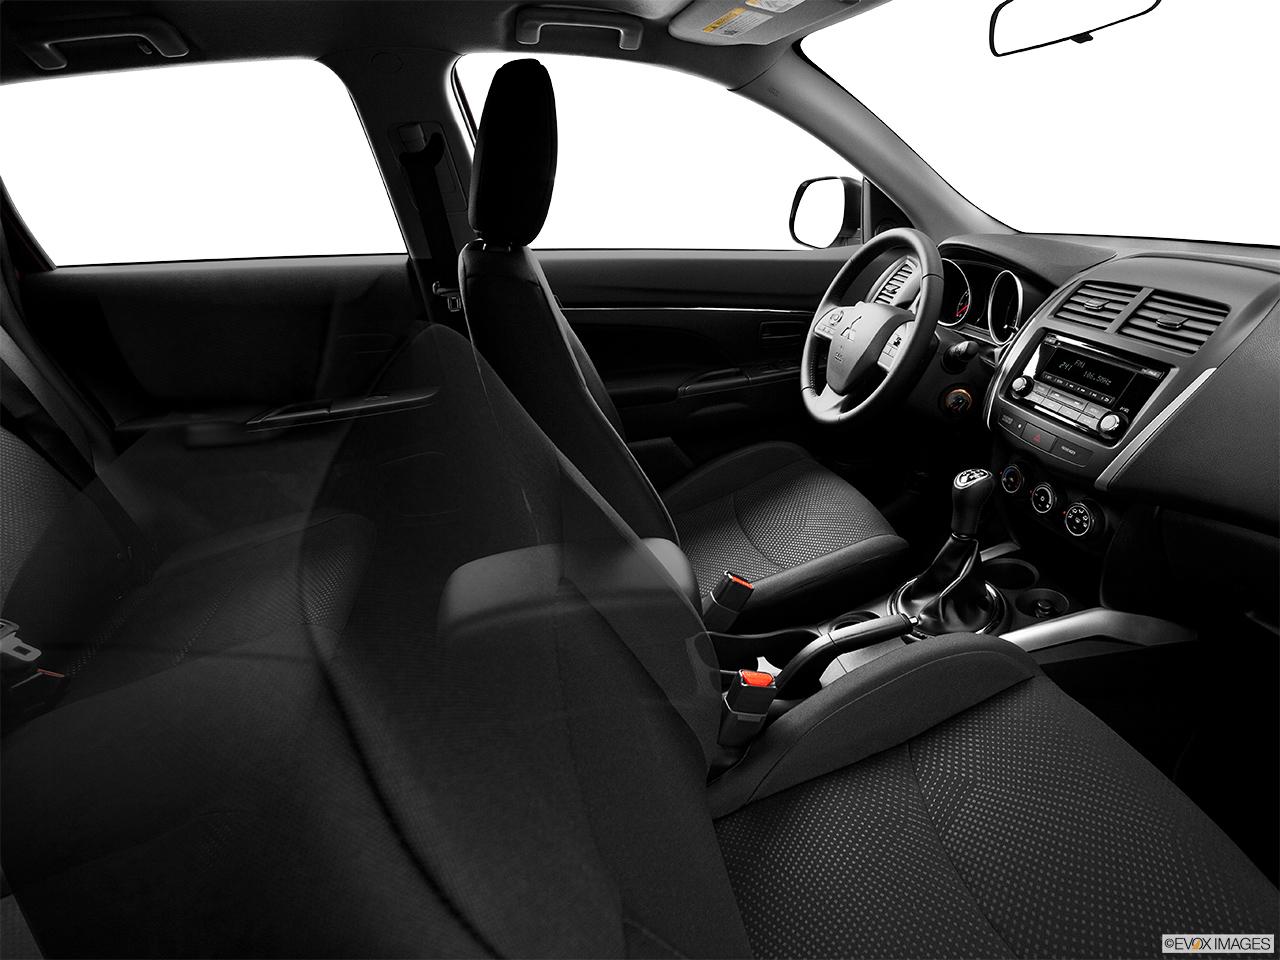 2014 mitsubishi outlander sport awd cvt es fake buck shot interior from passenger b